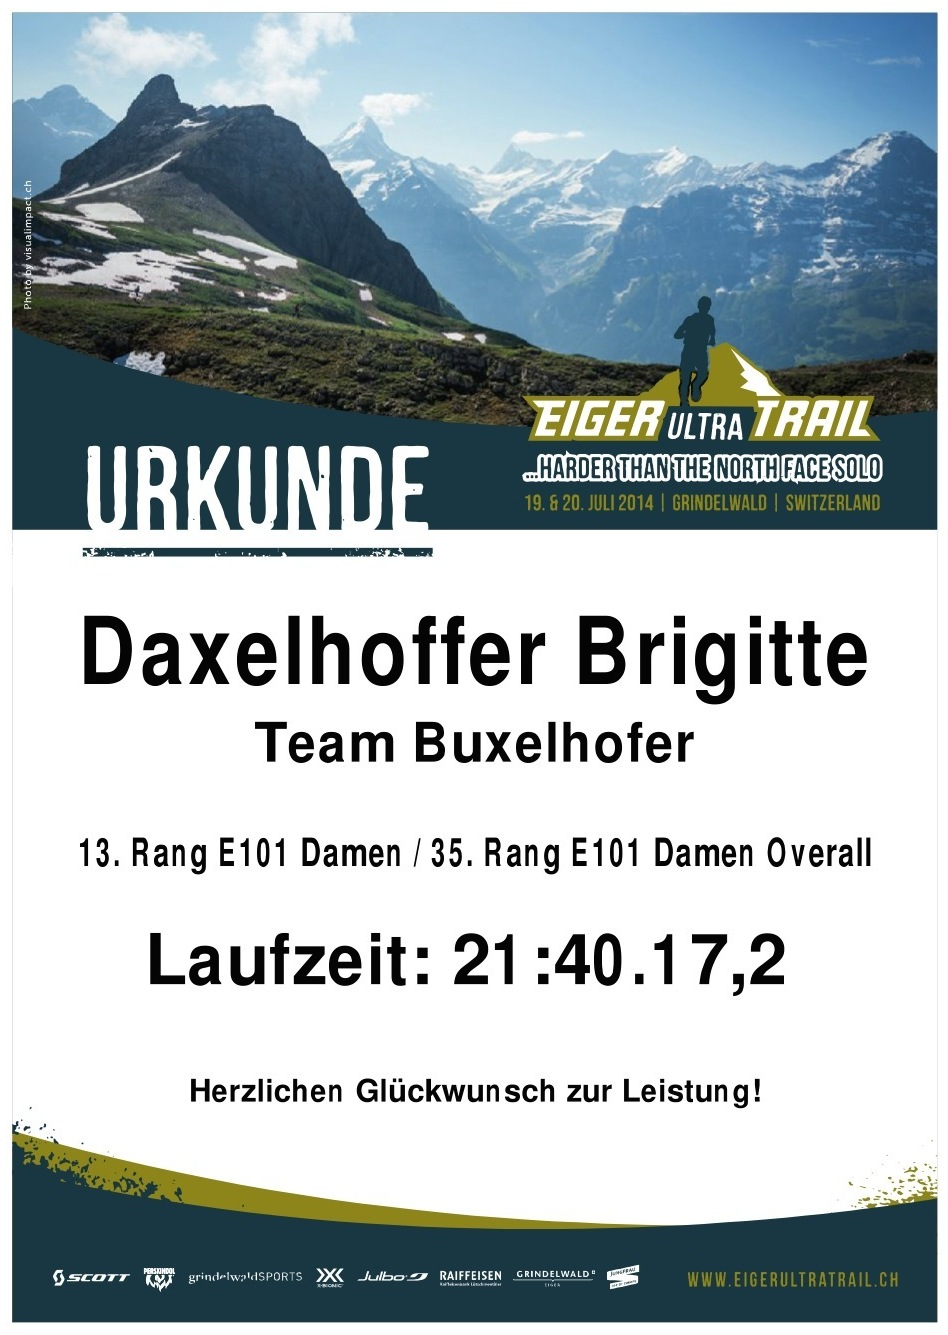 Diplom-Eiger-Ultra-Trail.jpg